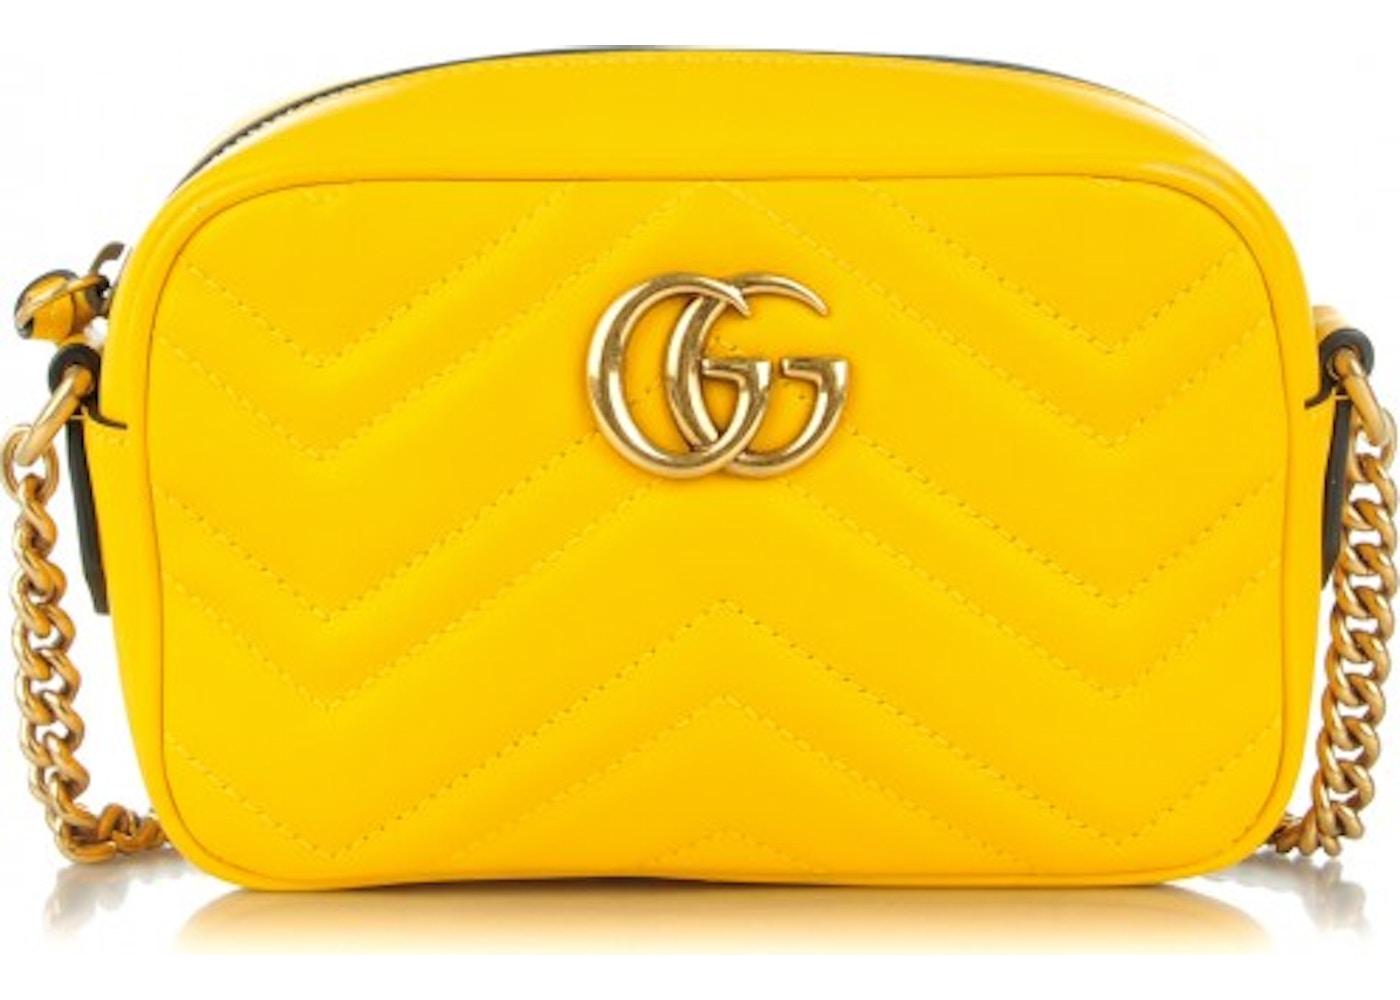 c74de0f63840 Gucci Marmont Camera Bag Matelasse Mini Yellow